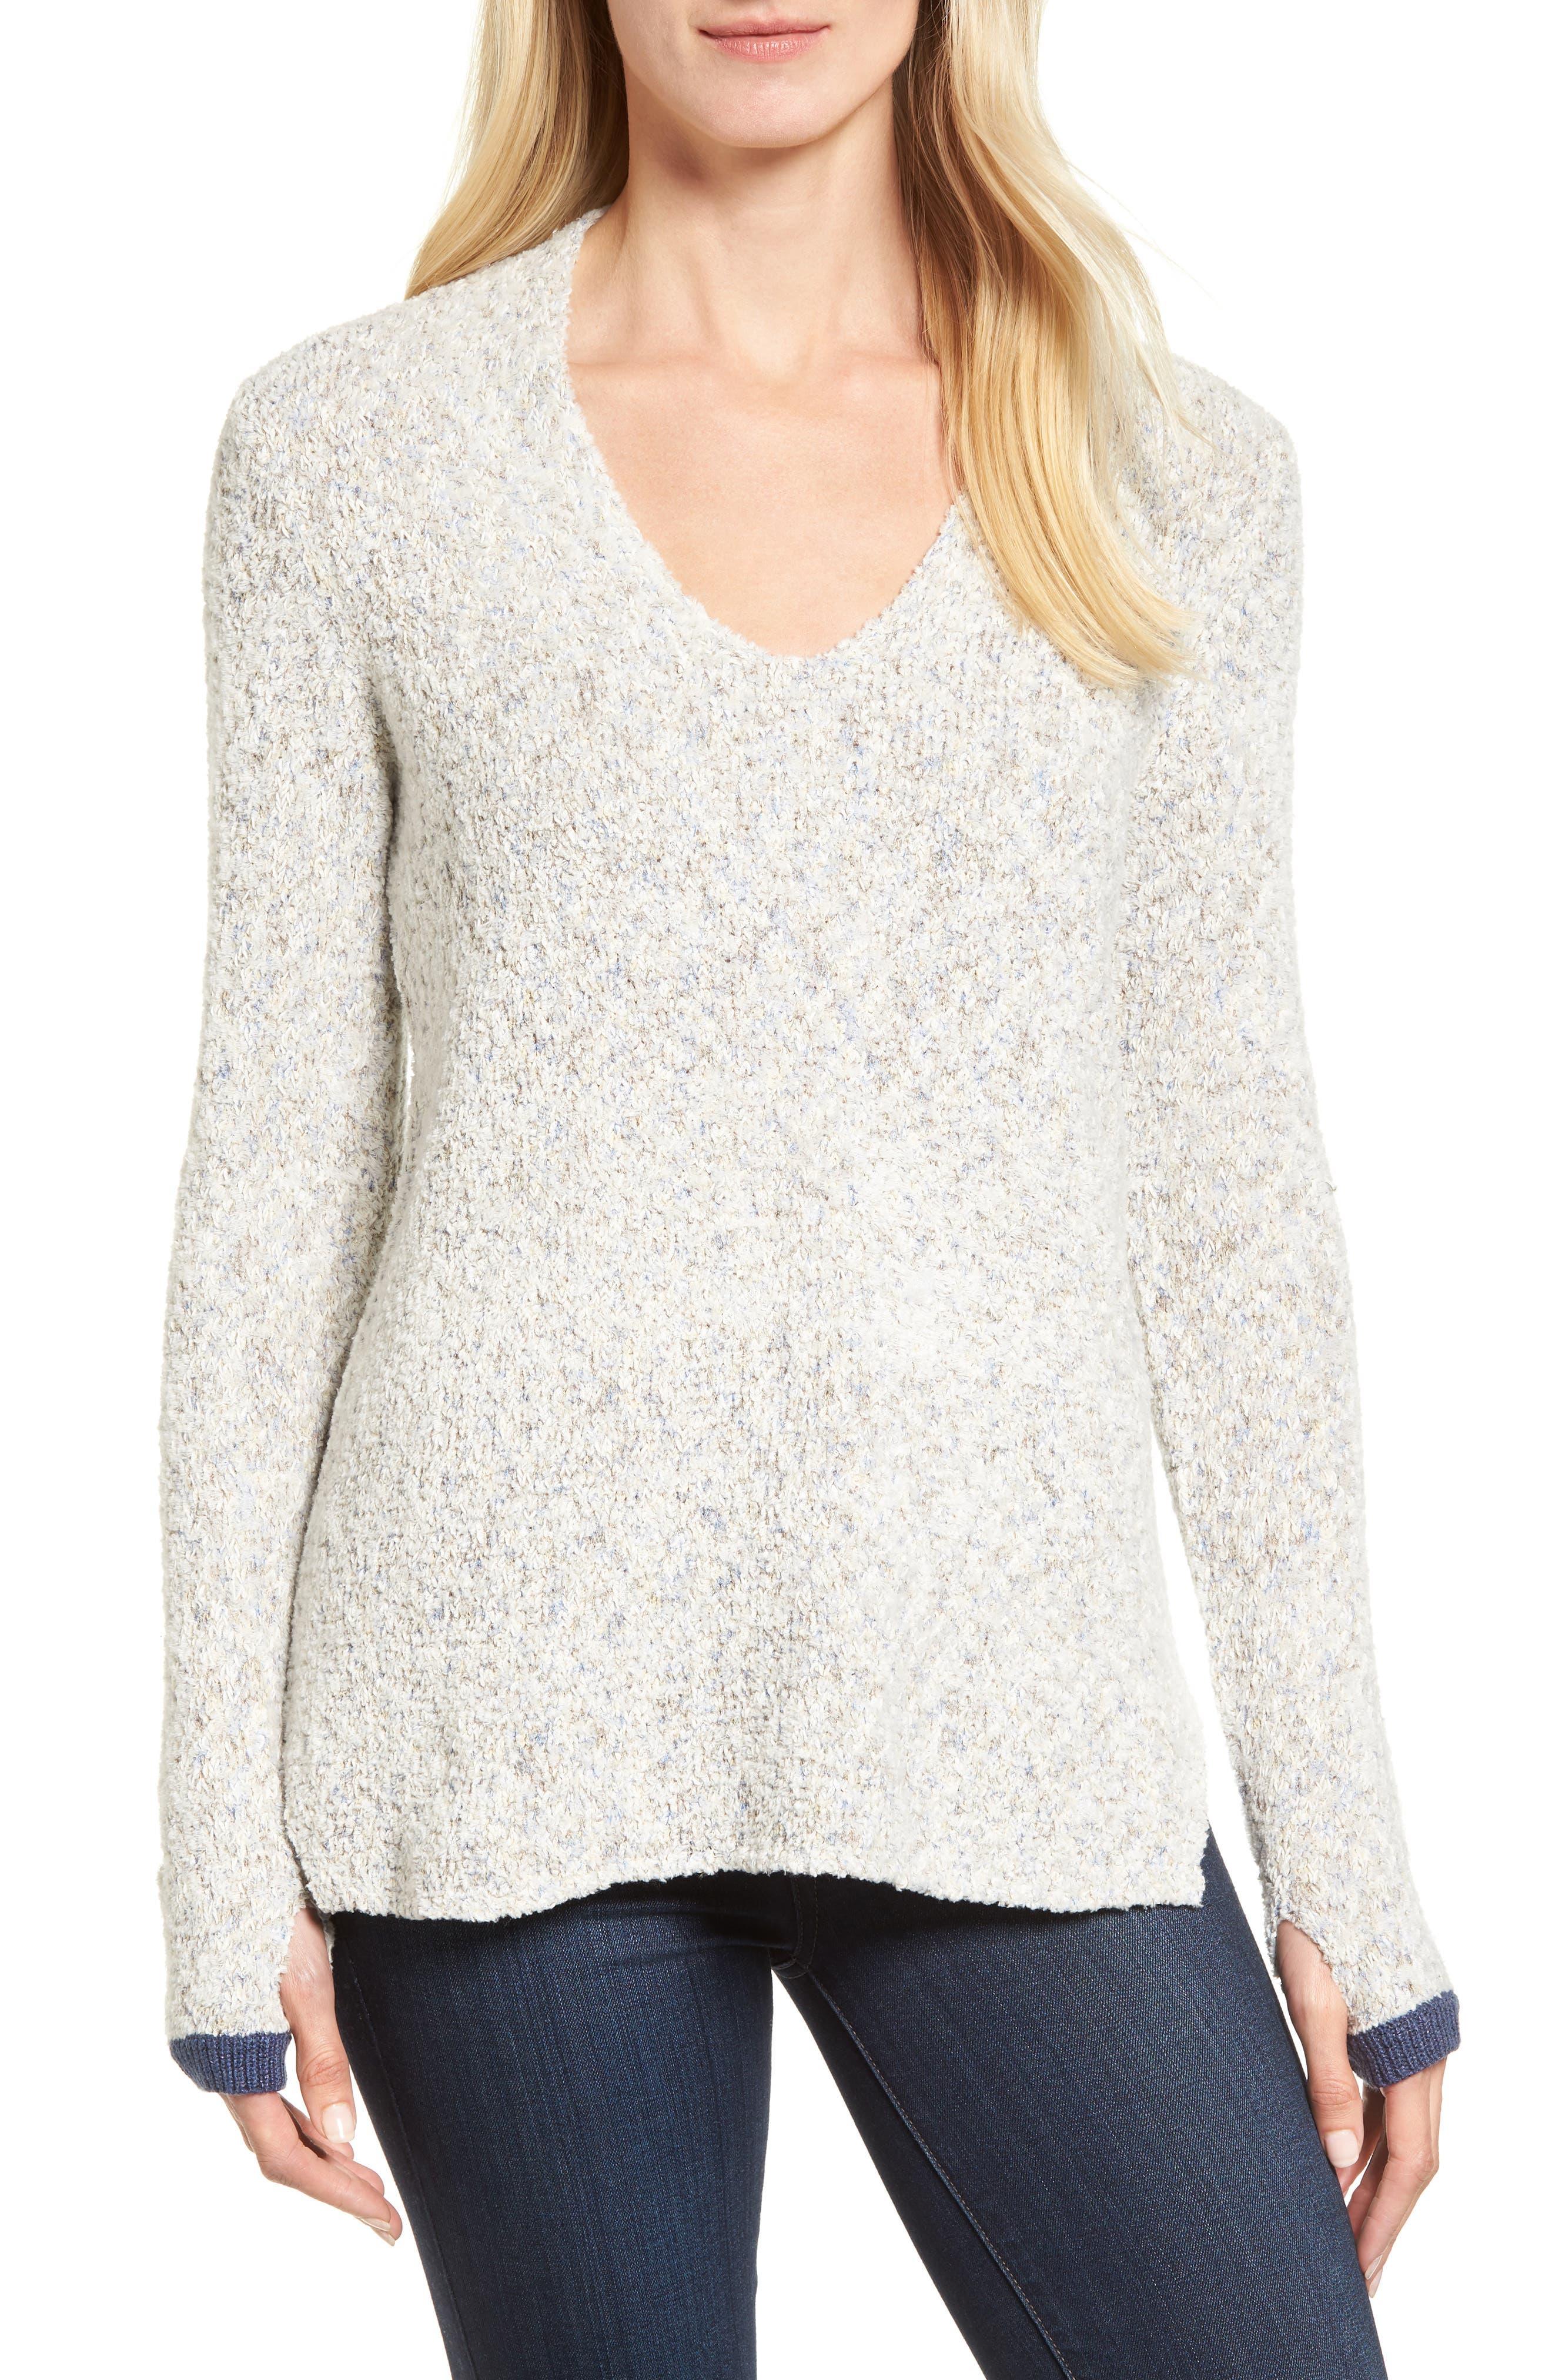 Main Image - NIC+ZOE Marled Montreal Sweater (Regular & Petite)